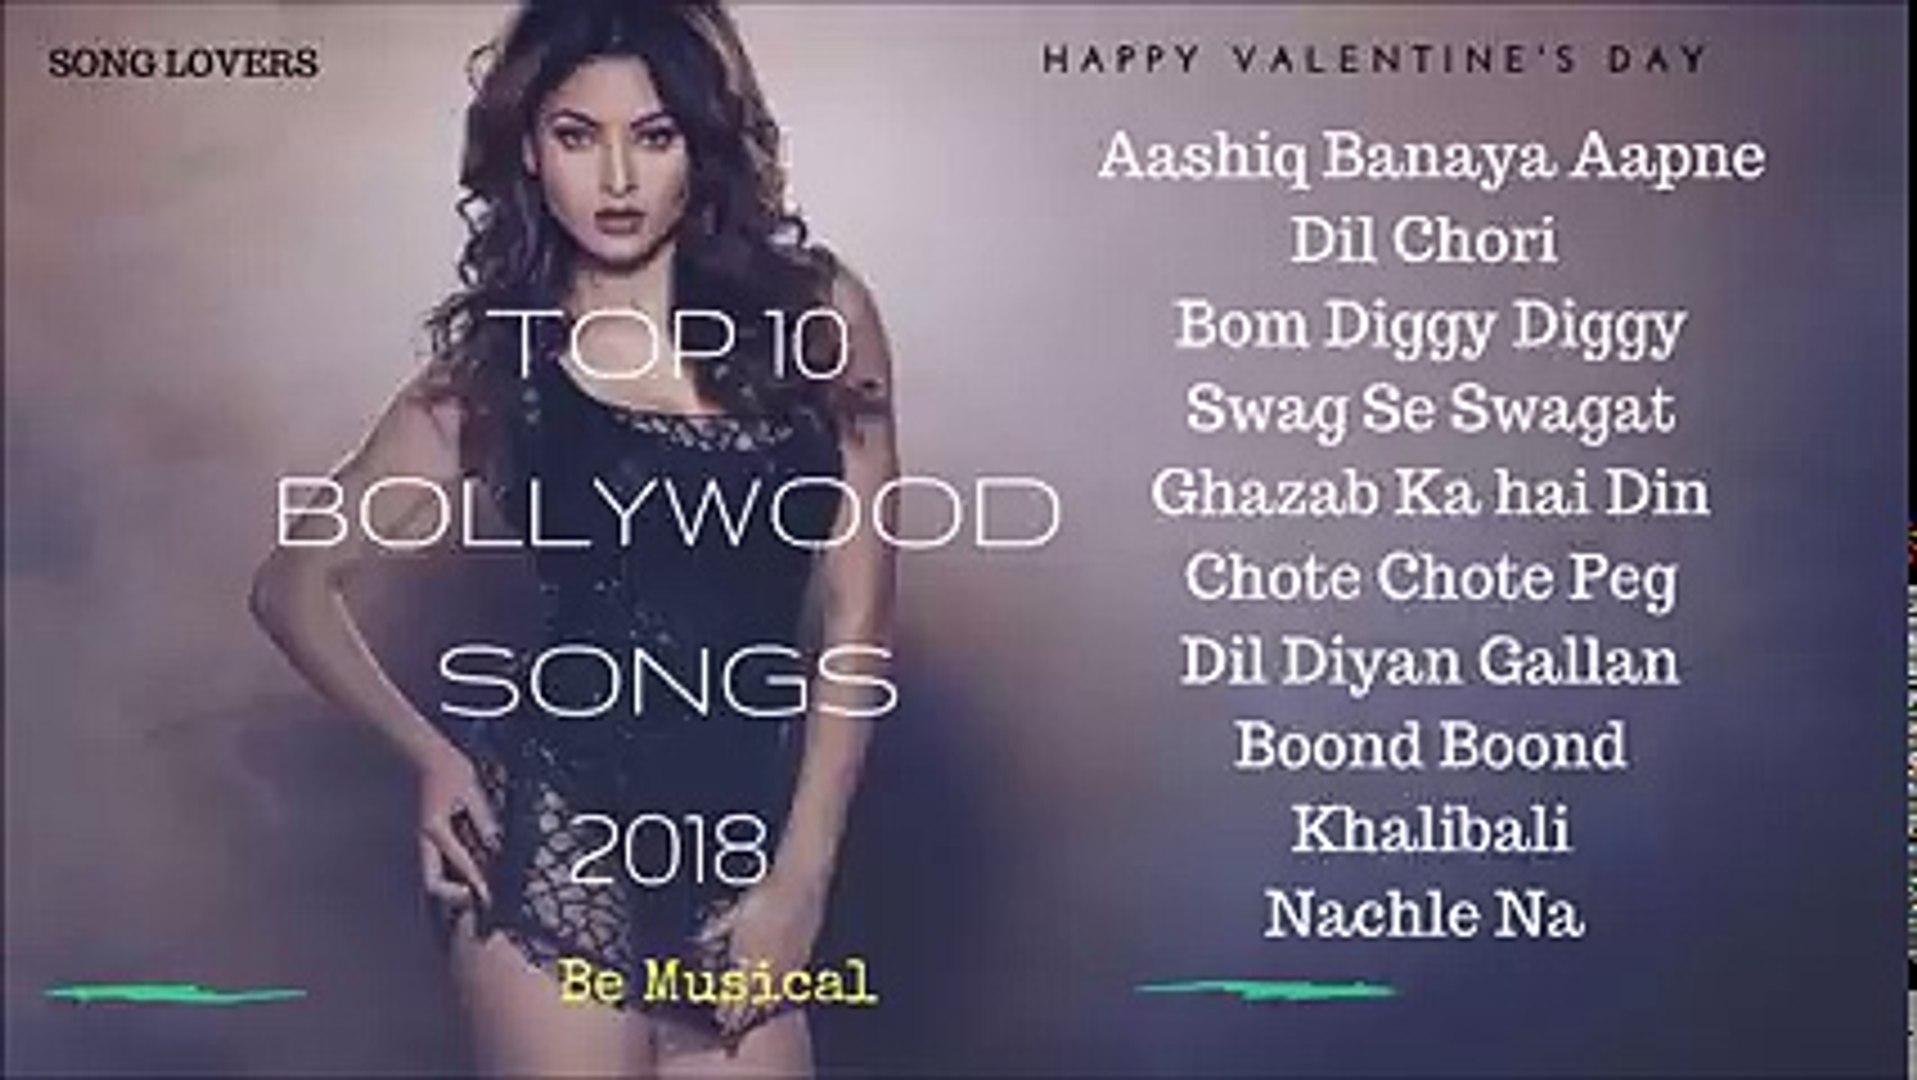 Singles songs audio ✌️ bollywood 2021 2018 list best Home